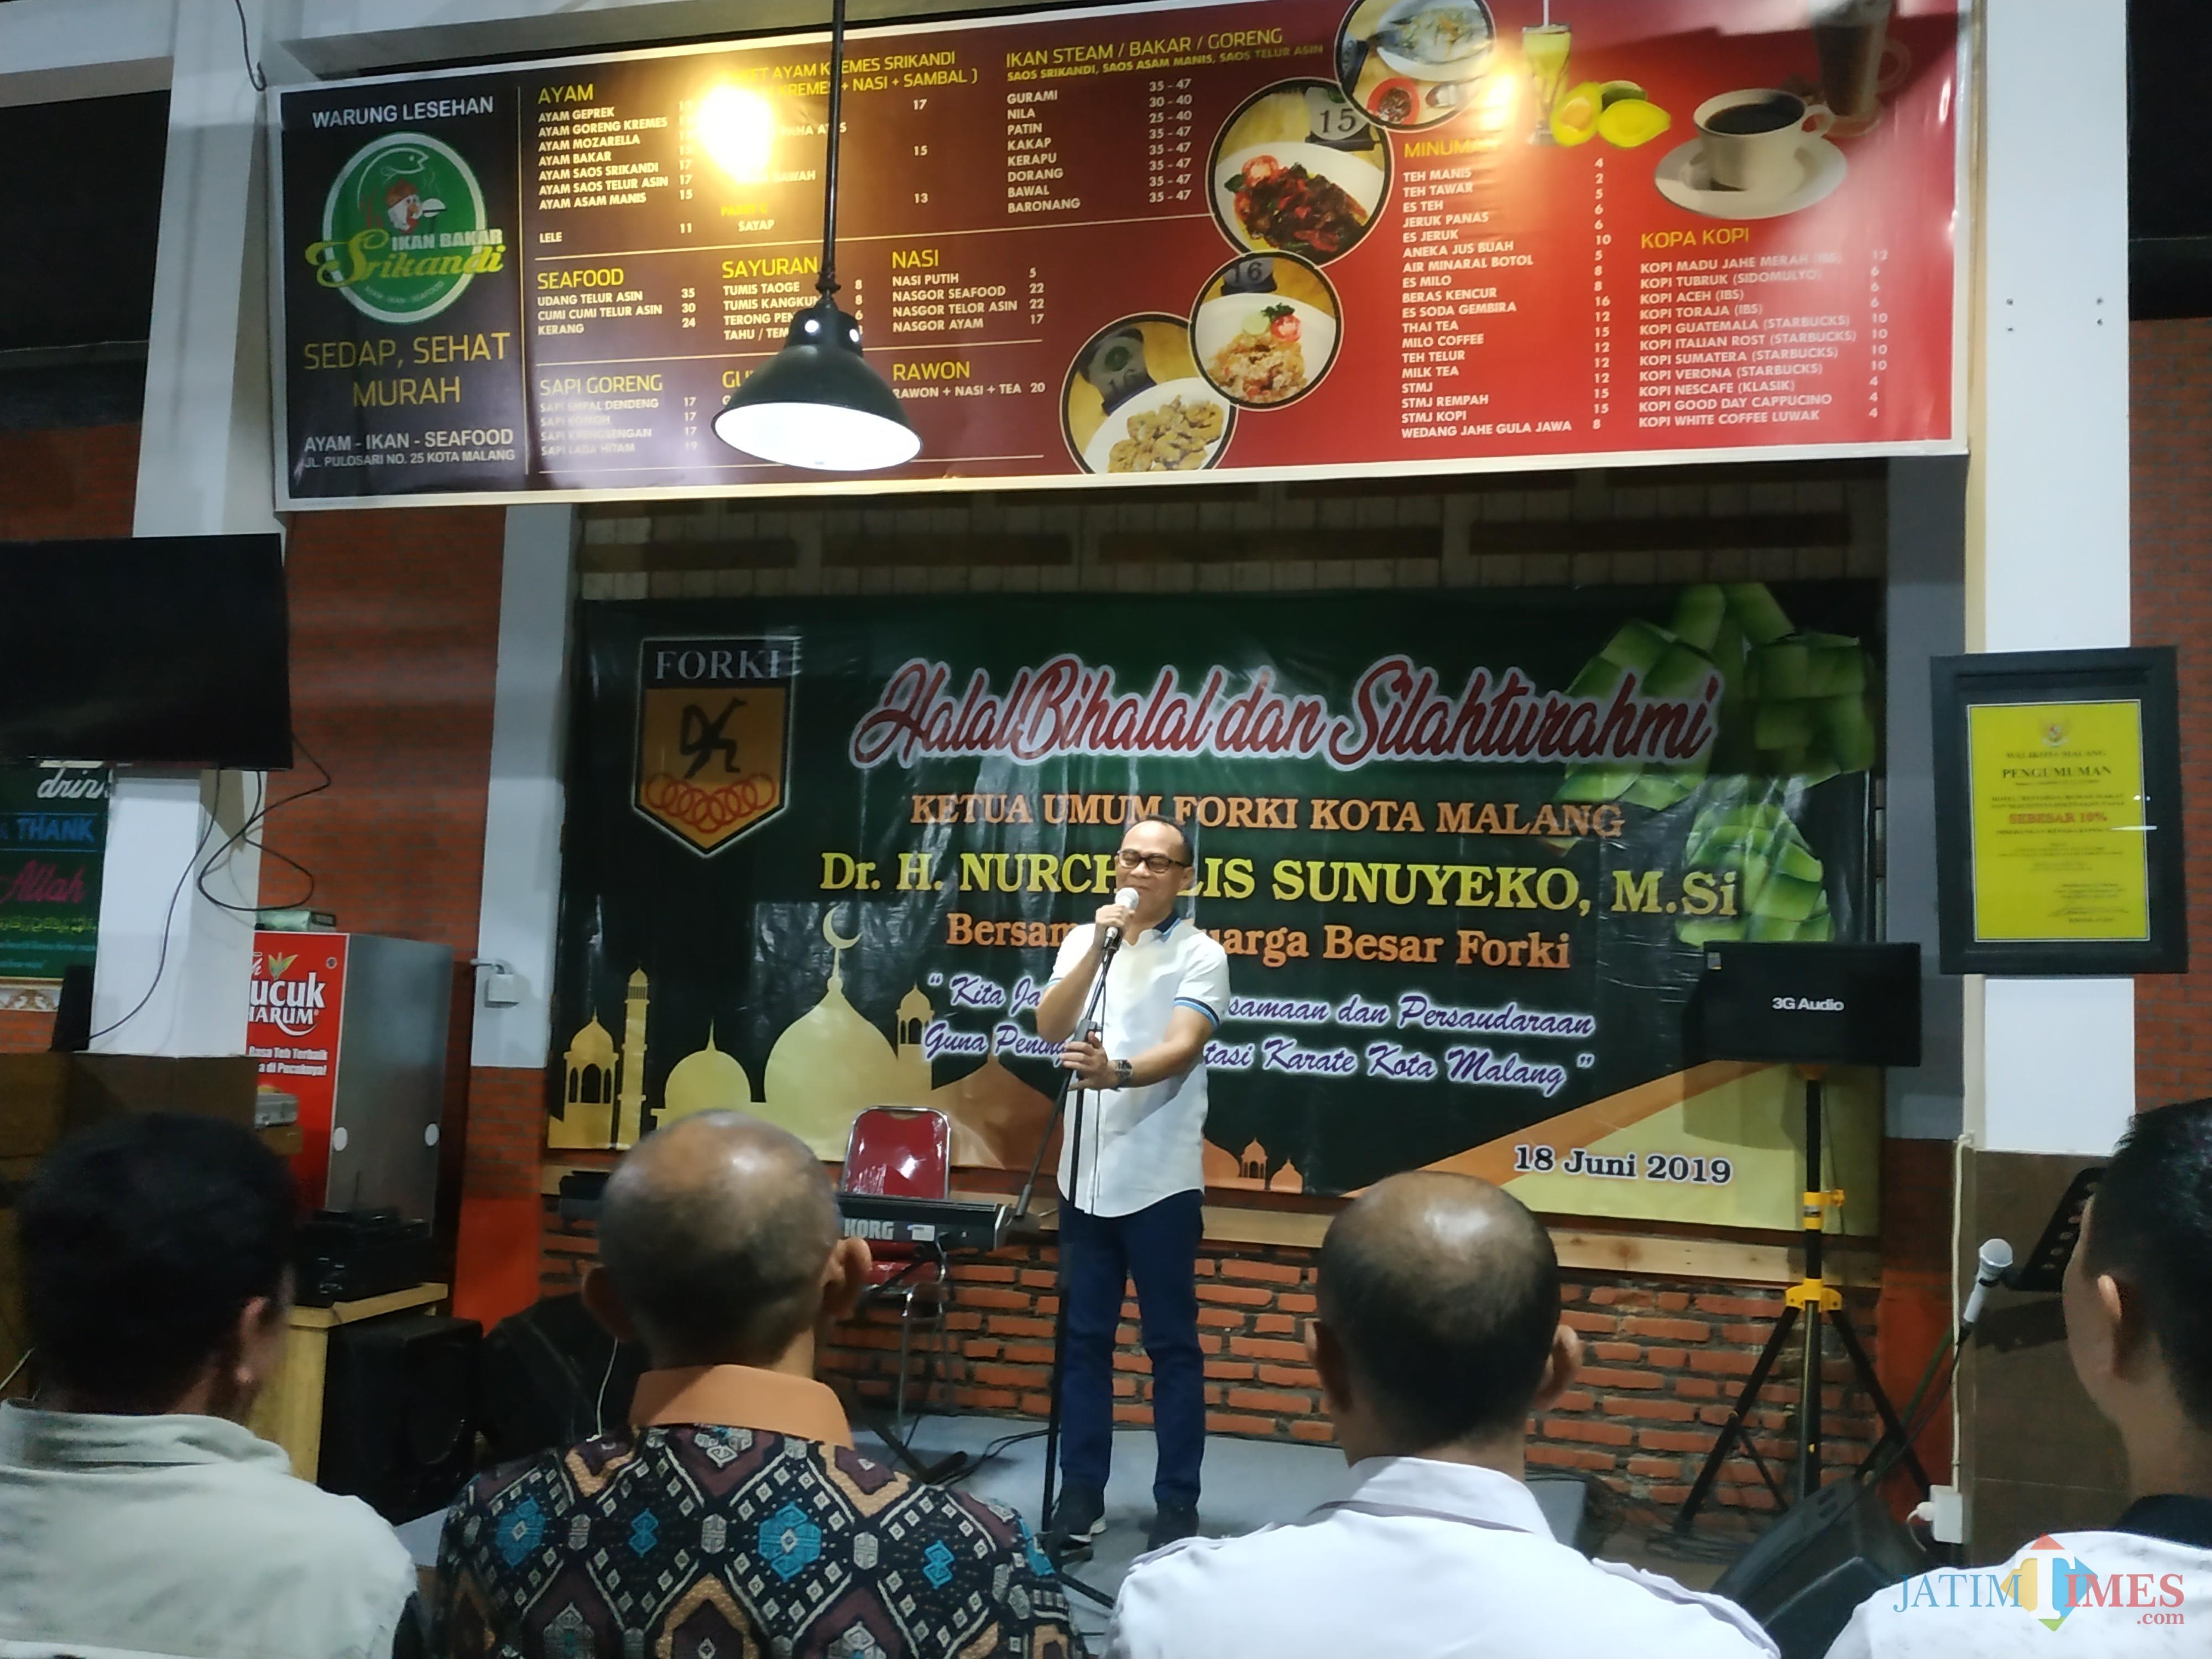 Ketua Umum Forki Kota Malang Nurcholis Sunuyeko saat memberikan sambutan dalam acara halalbihalal dengan KONI Kota Malang dan cabang olahraga. (Hendra Saputra)